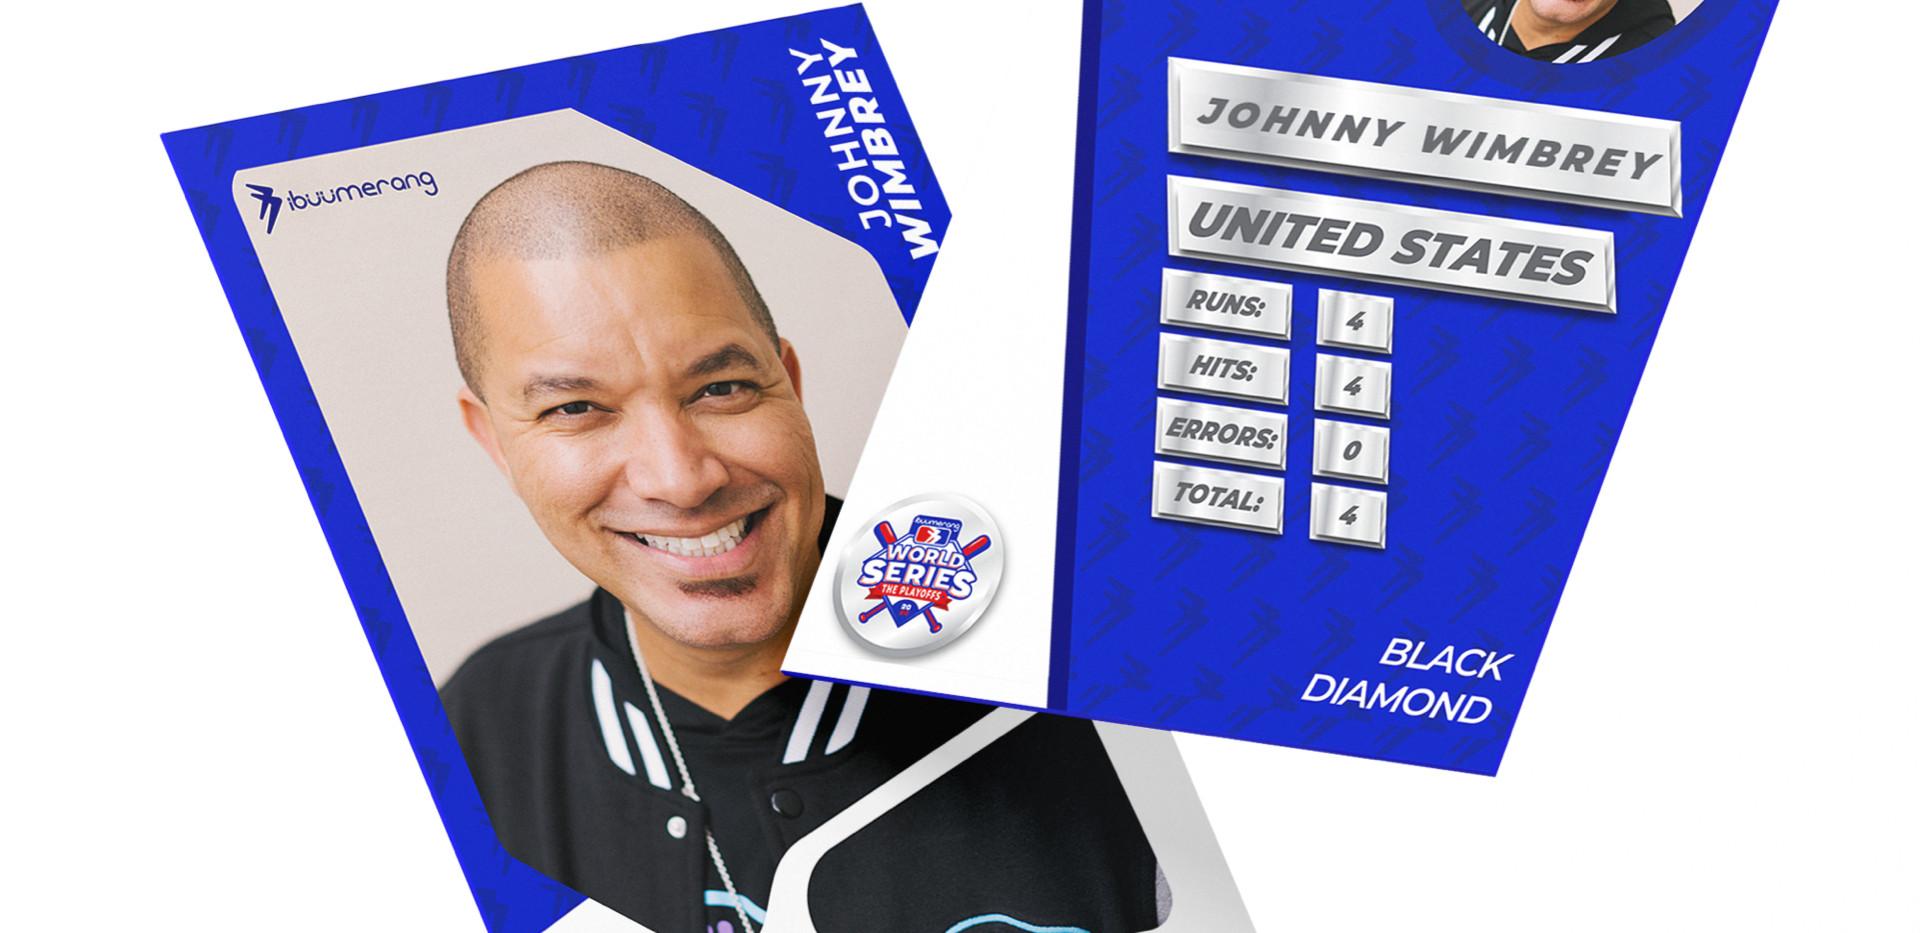 CARDS SQUARE 28 JULY.003.jpeg